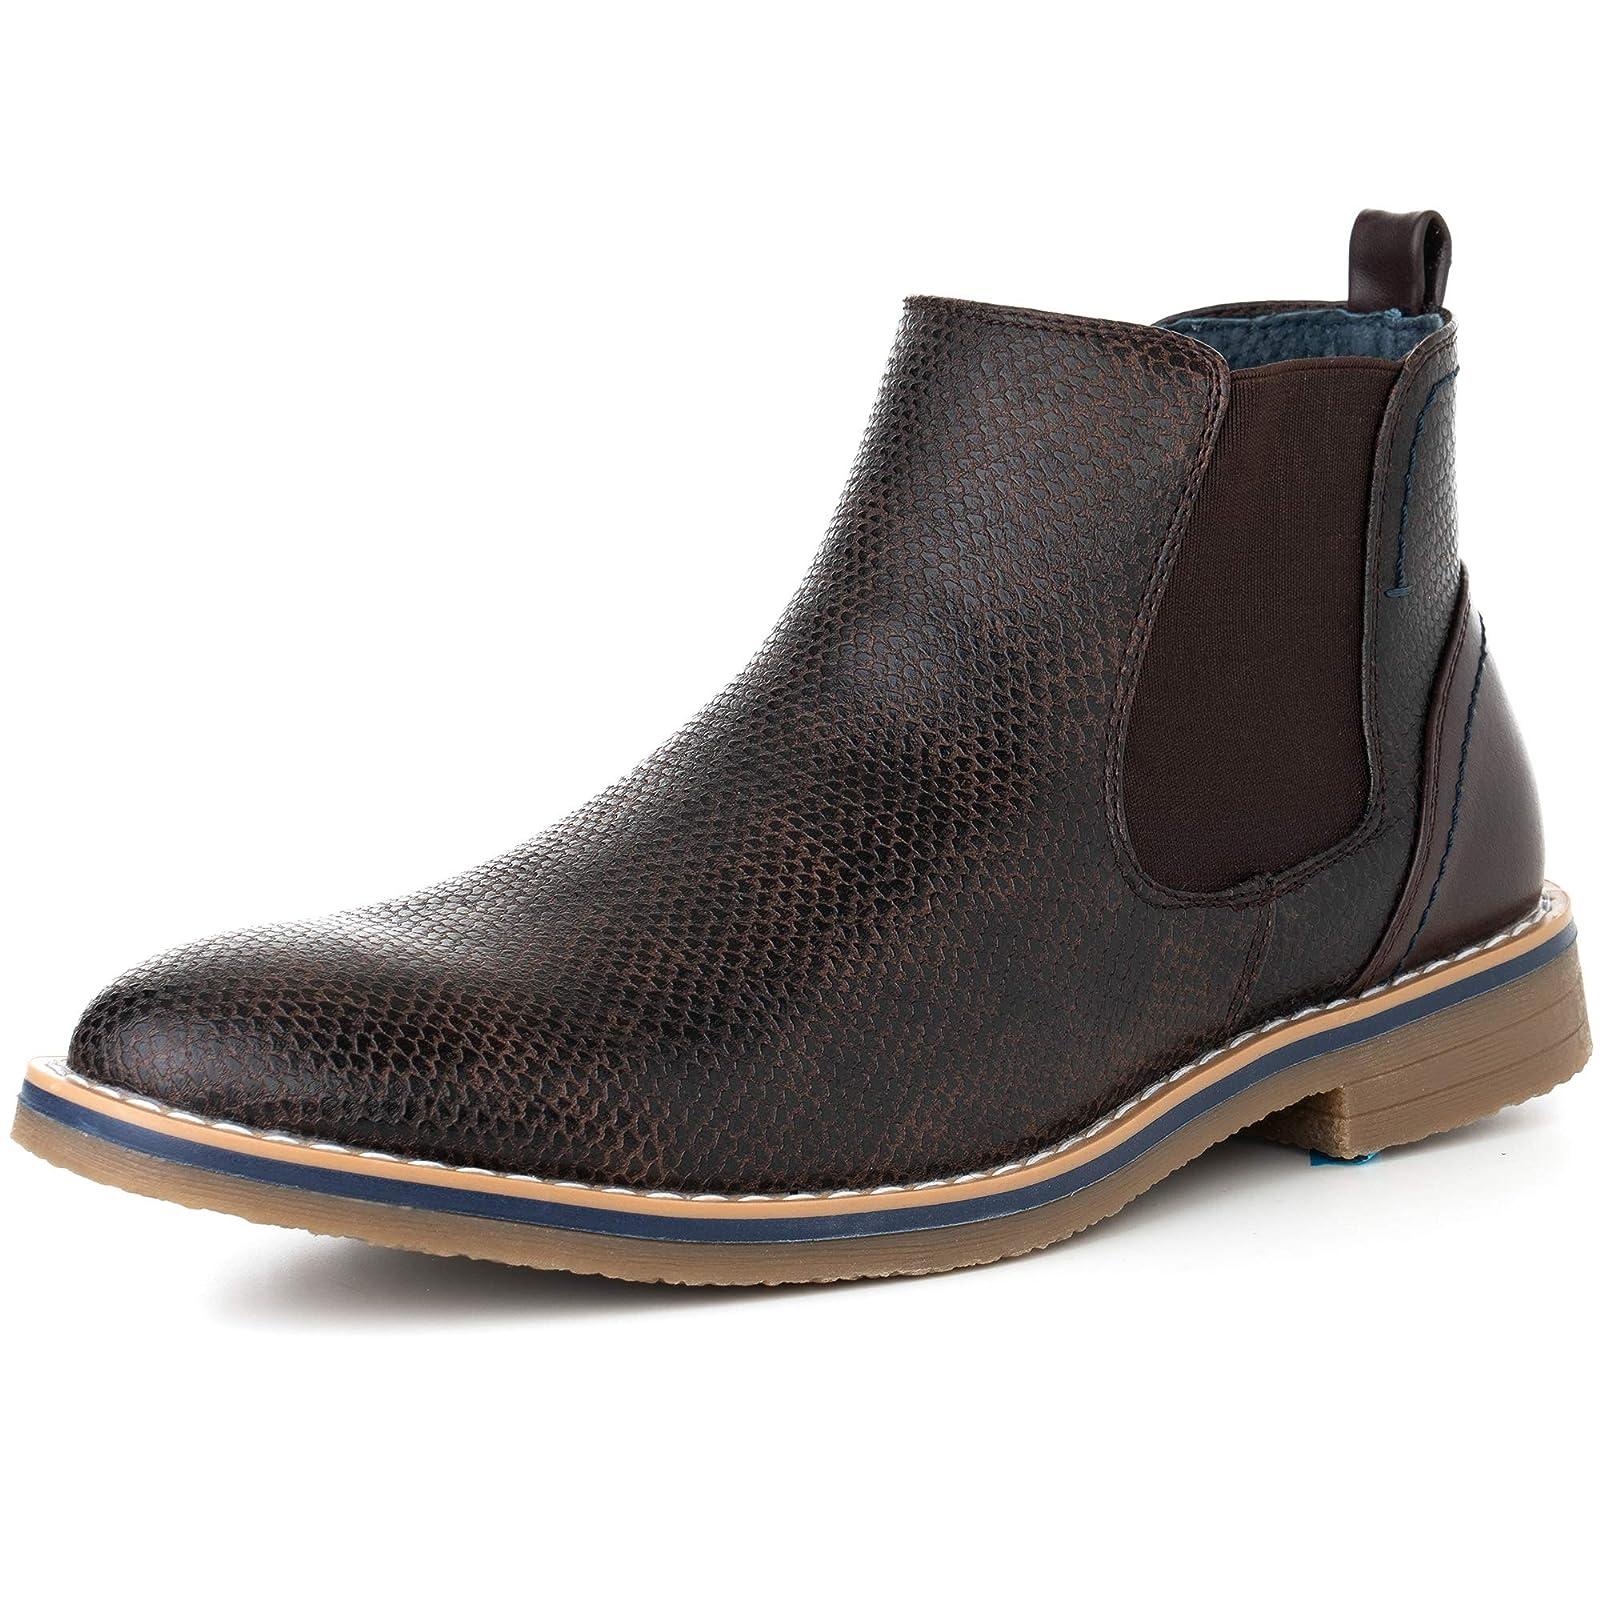 alpine swiss Men's Nash Chelsea Boots By Alpine Swiss - 3